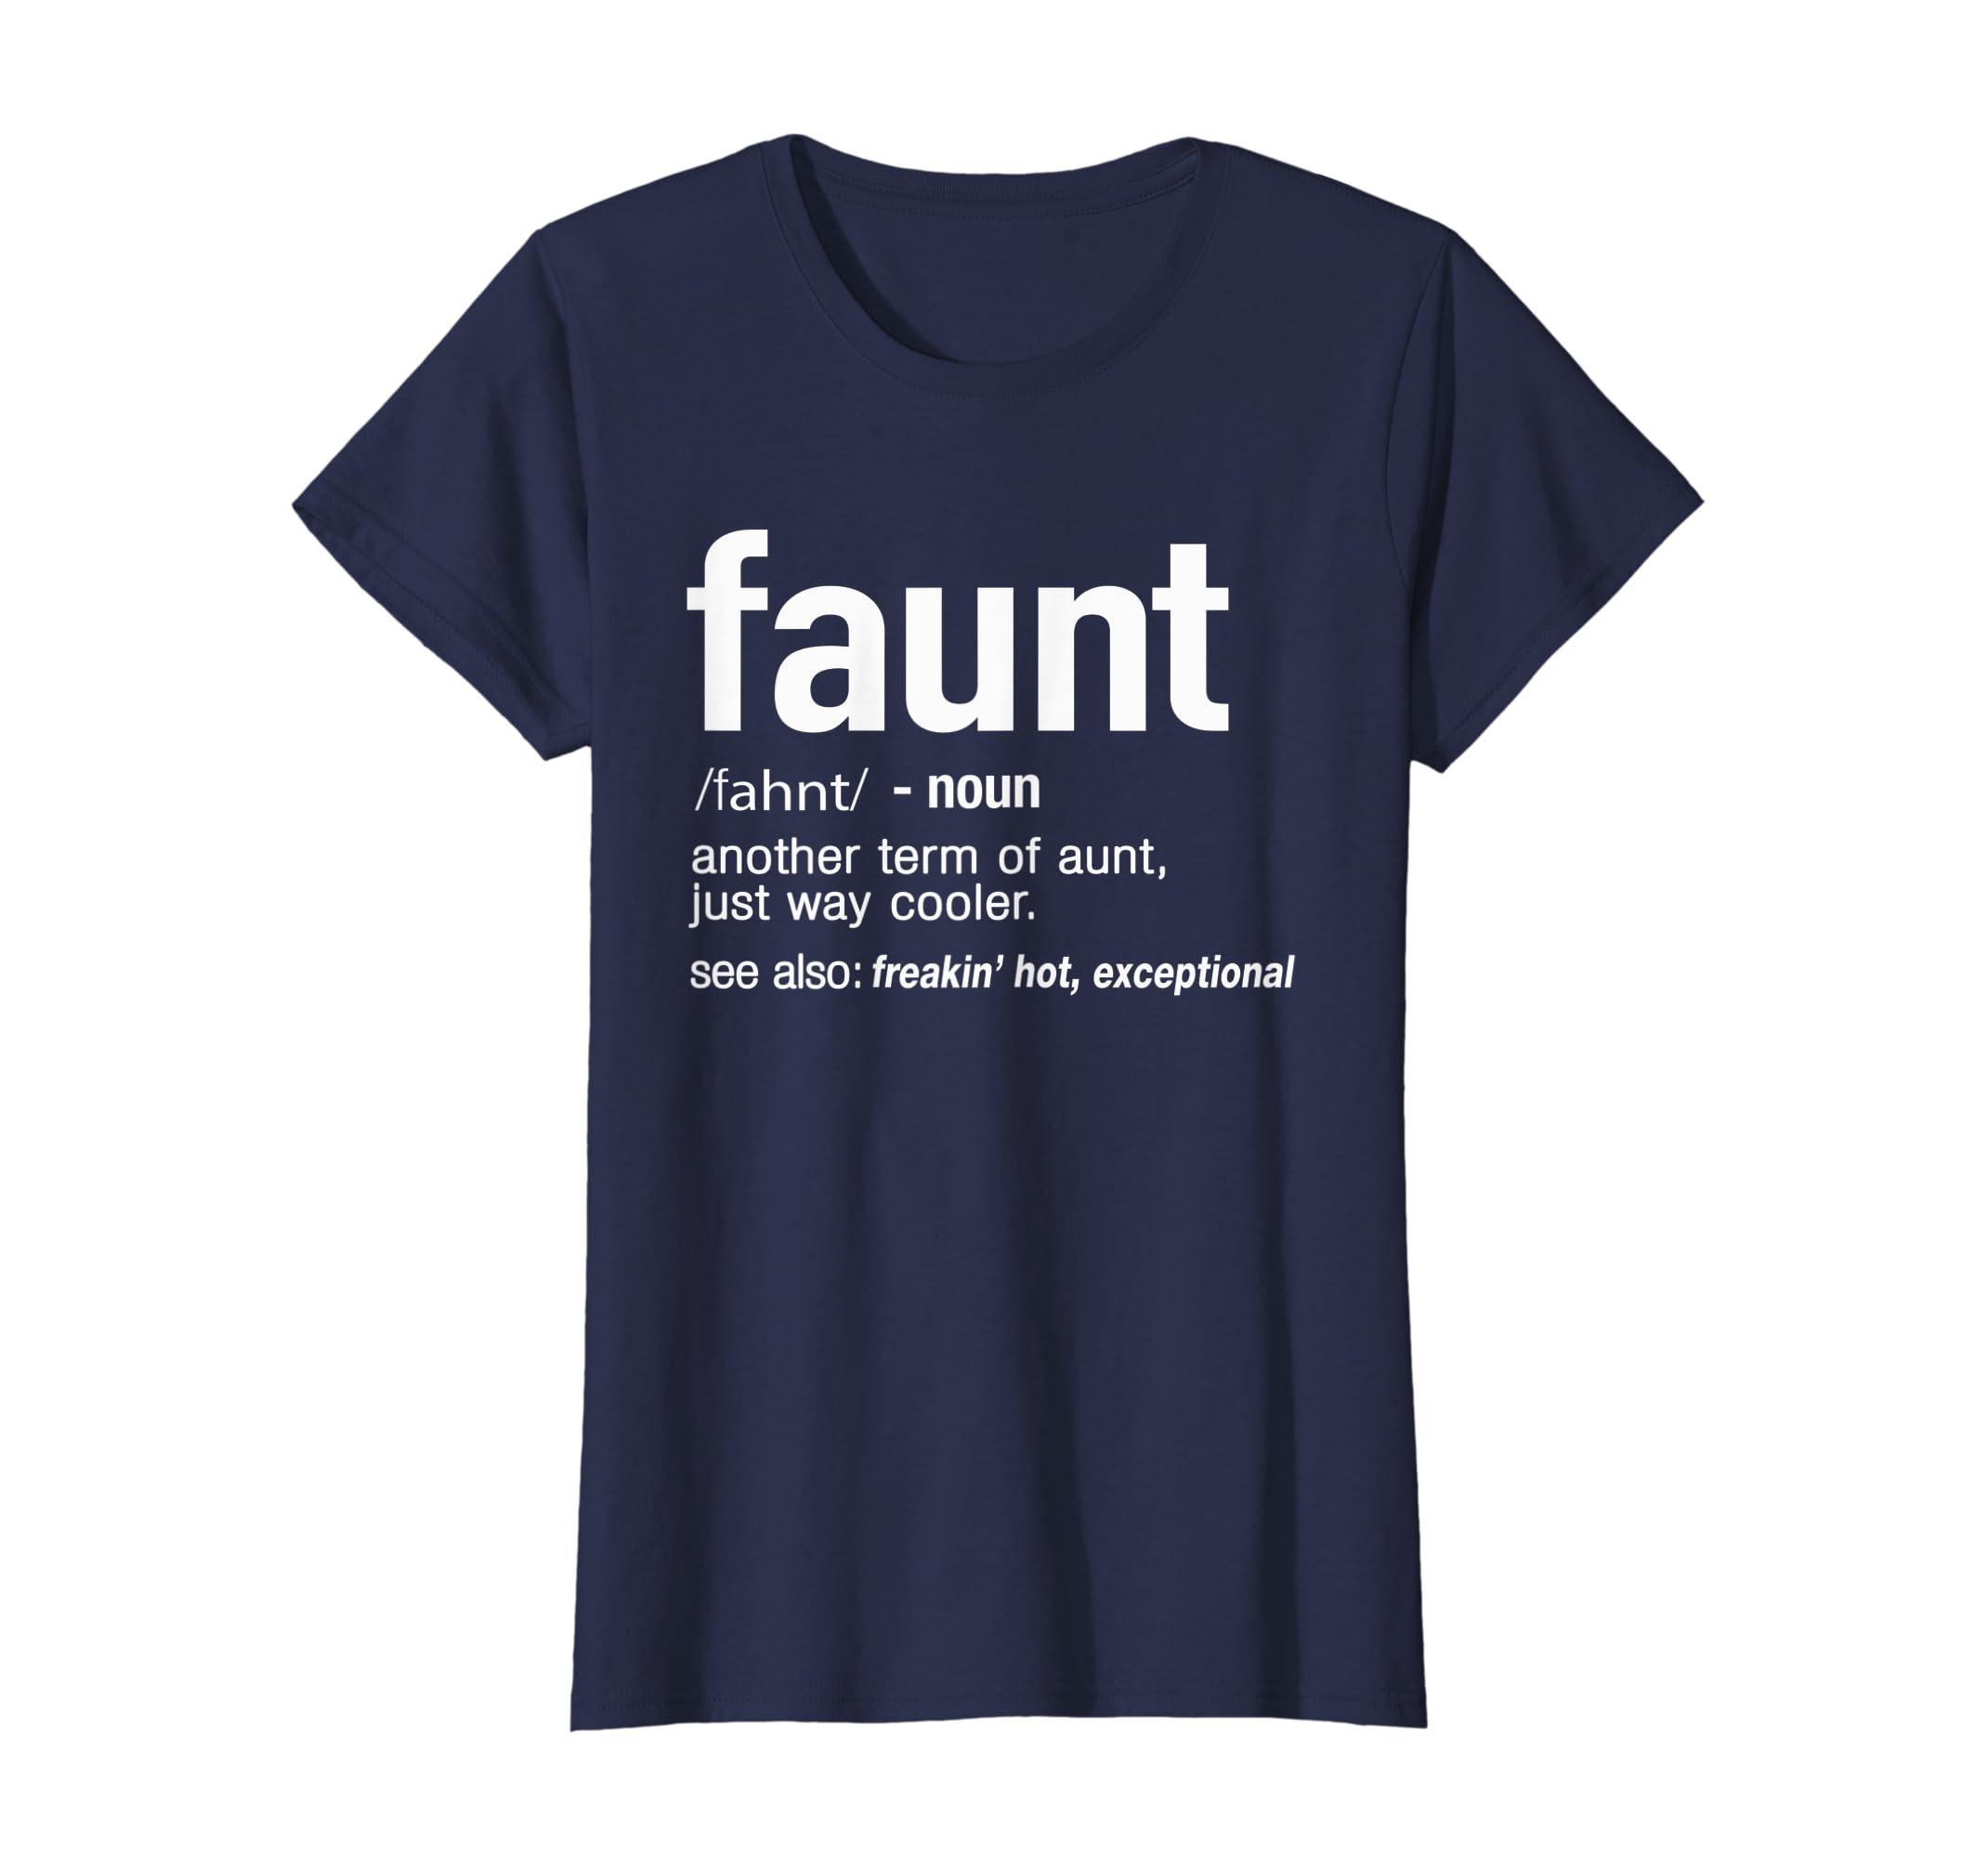 fe57b5ec Amazon.com: FAUNT Definition Aunt Funny T-Shirt: Clothing